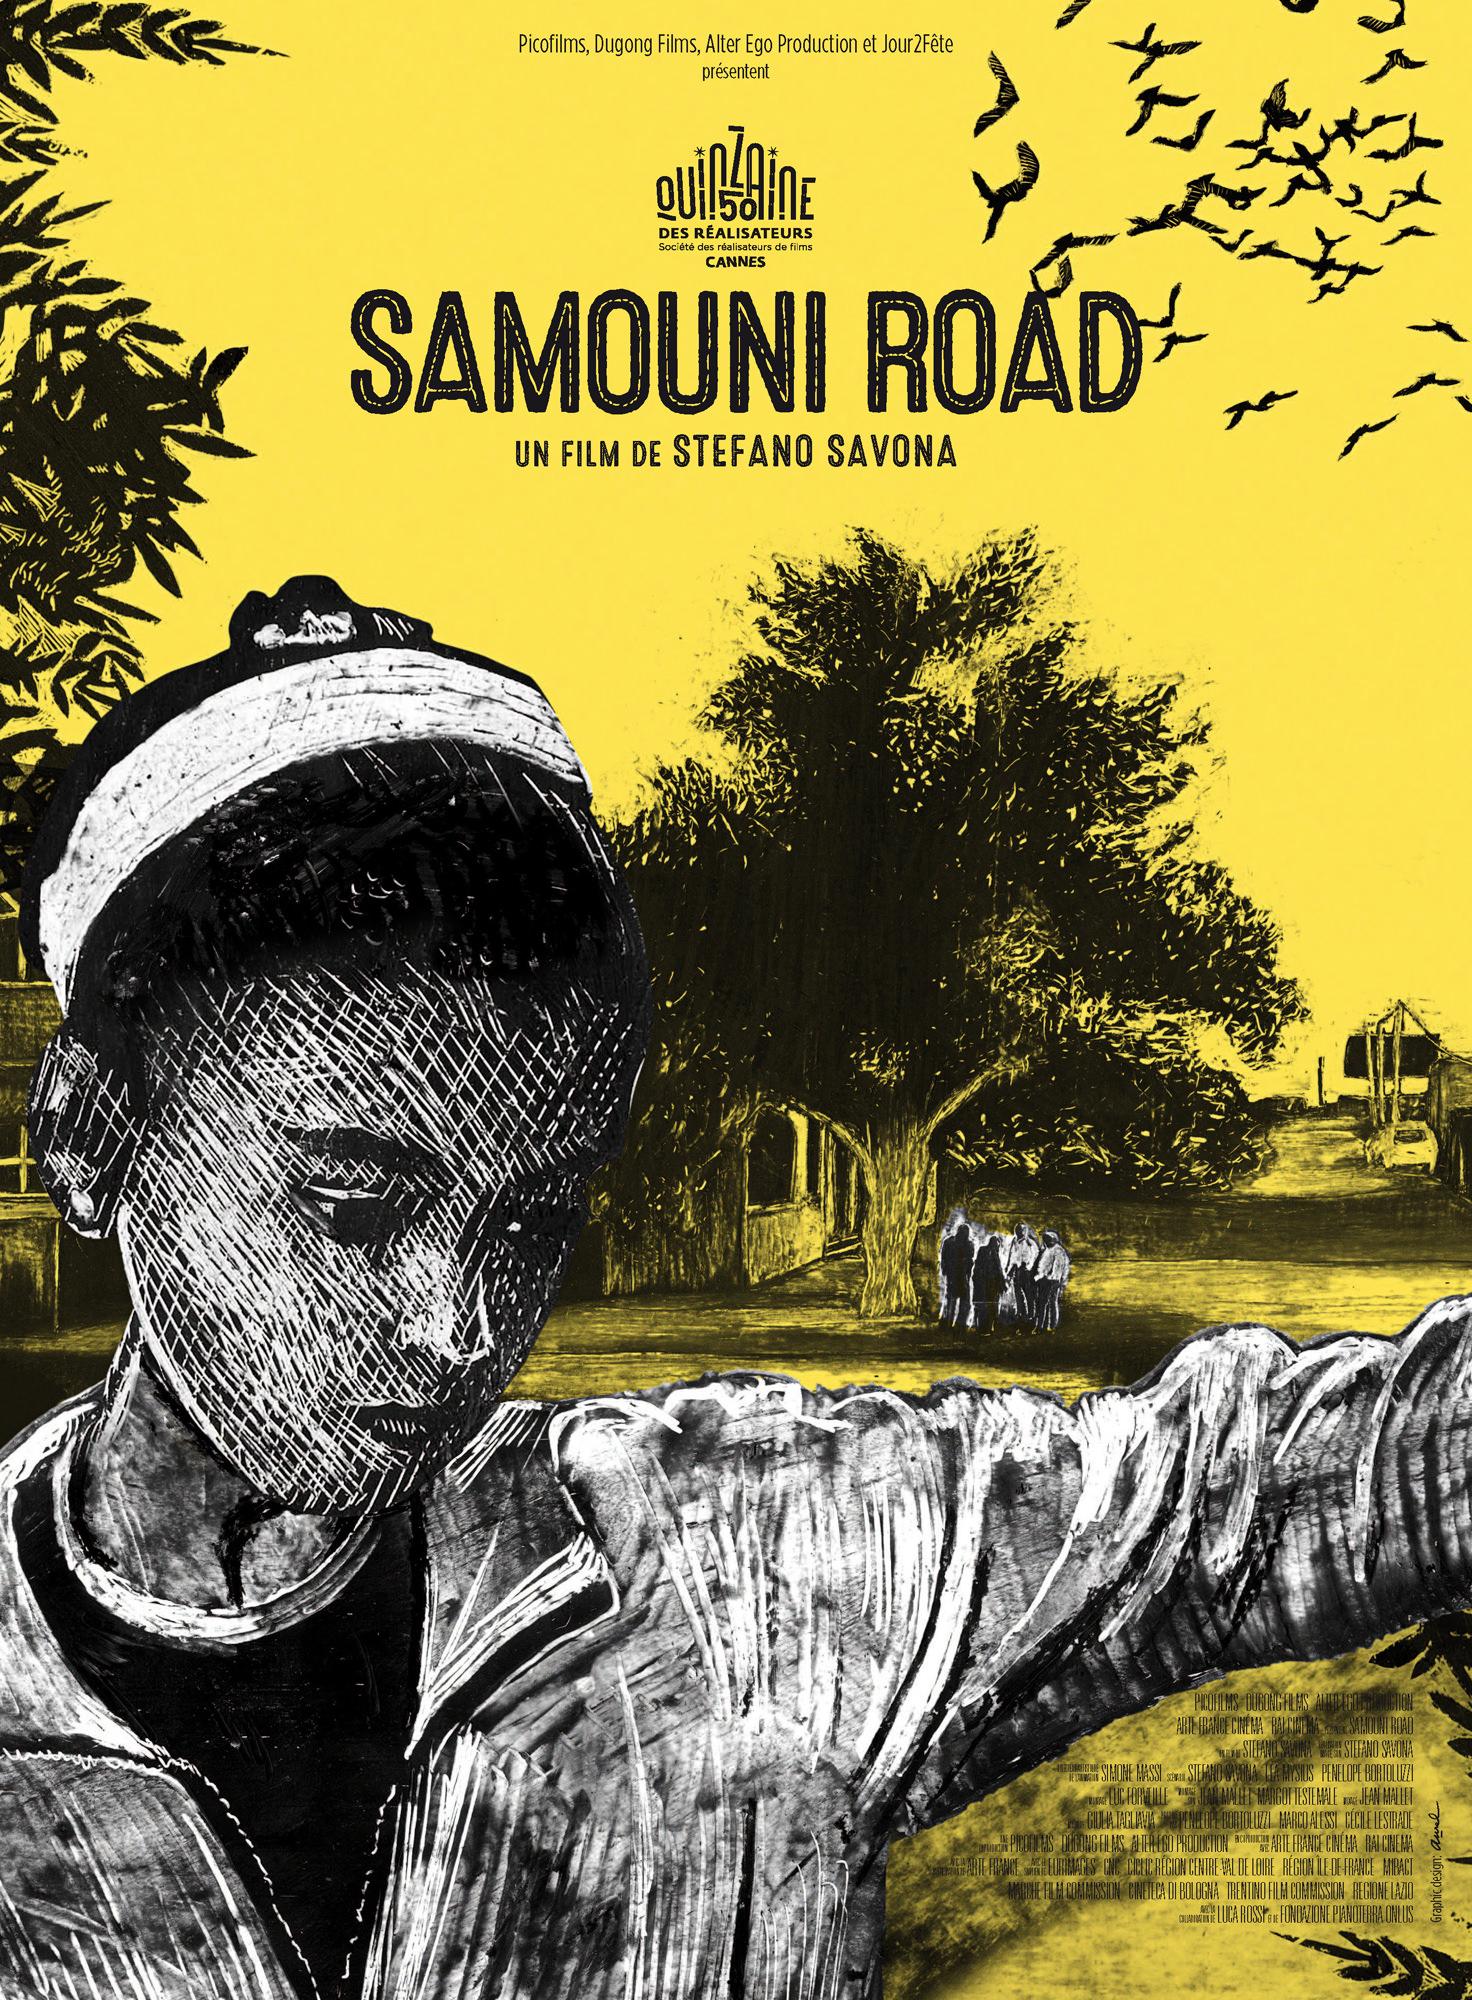 Samouni Road - Affiche Cannes 2018